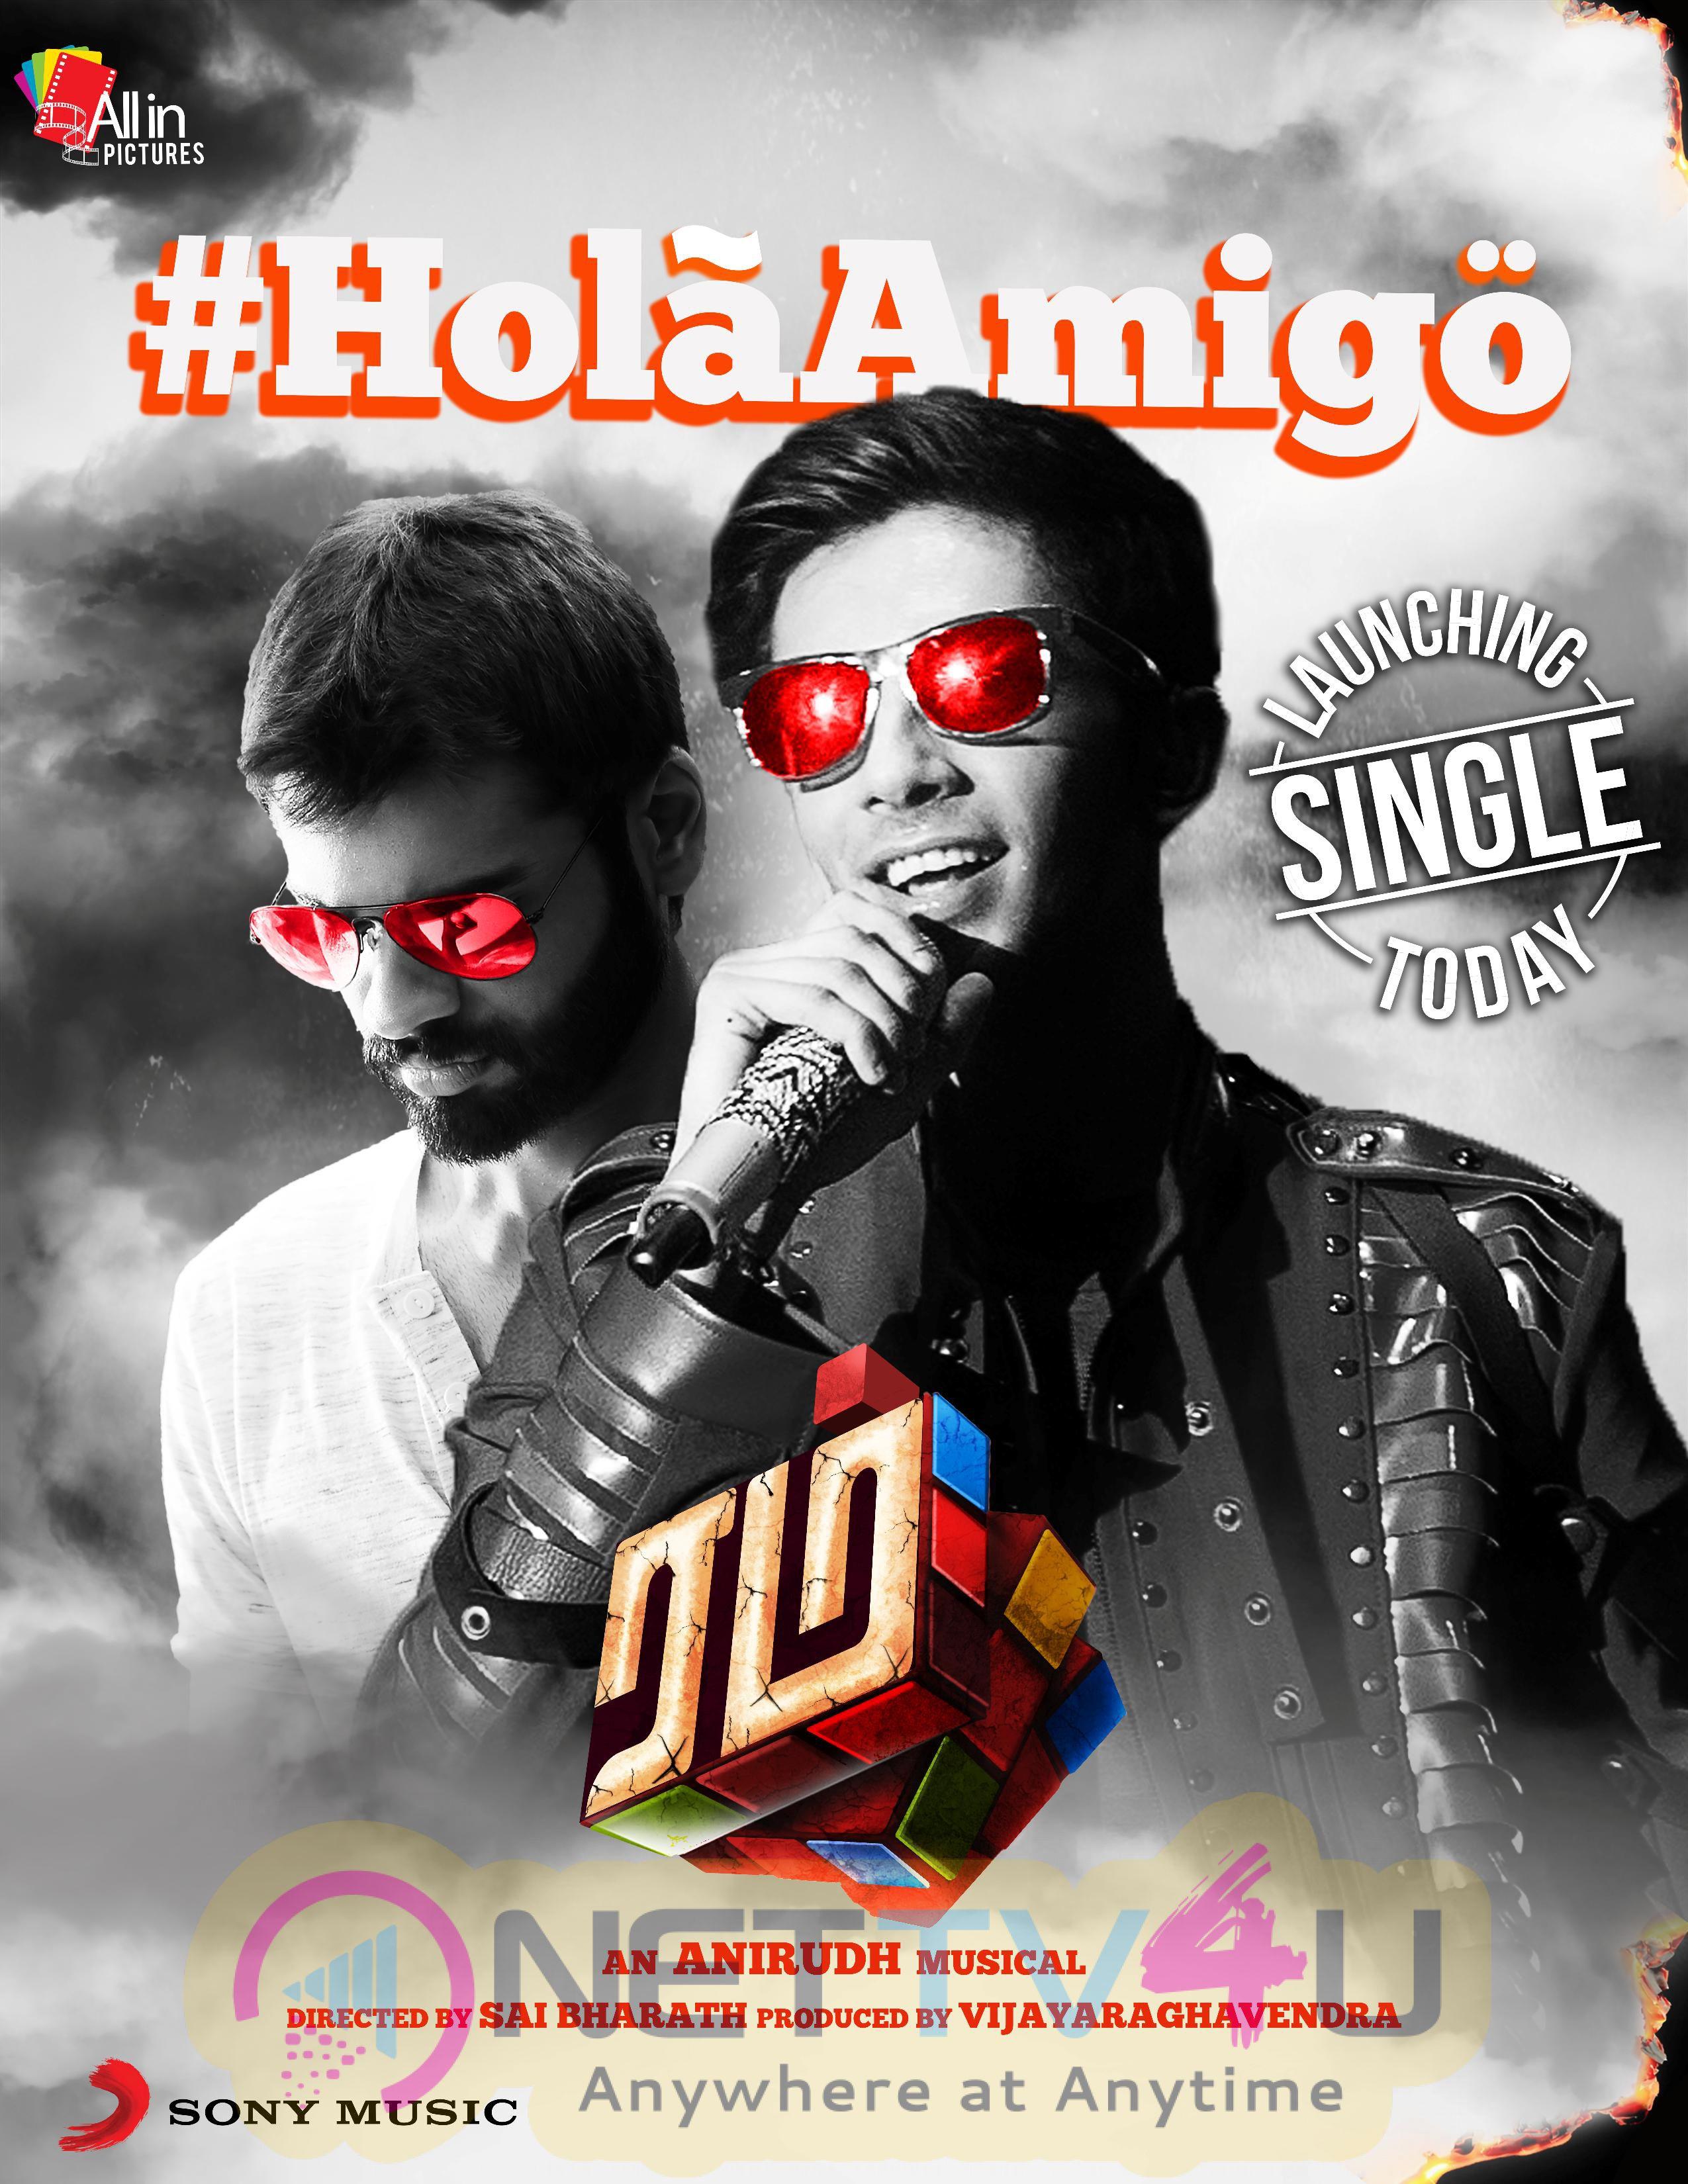 RUM - Hola Amigo Single Track Launch Today Stills